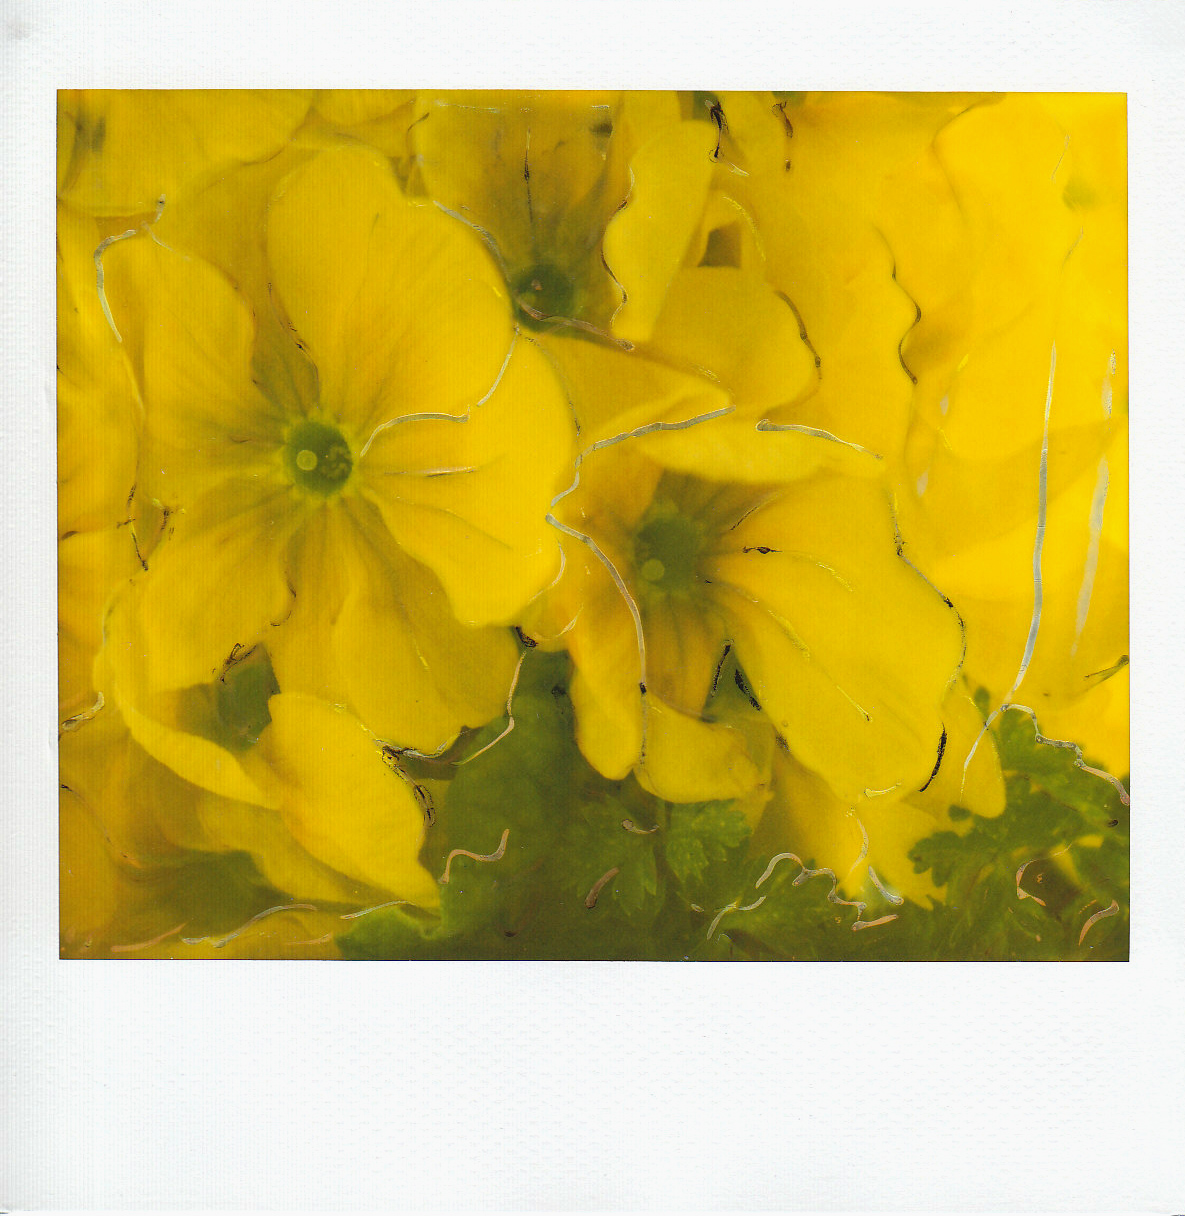 fiore-3